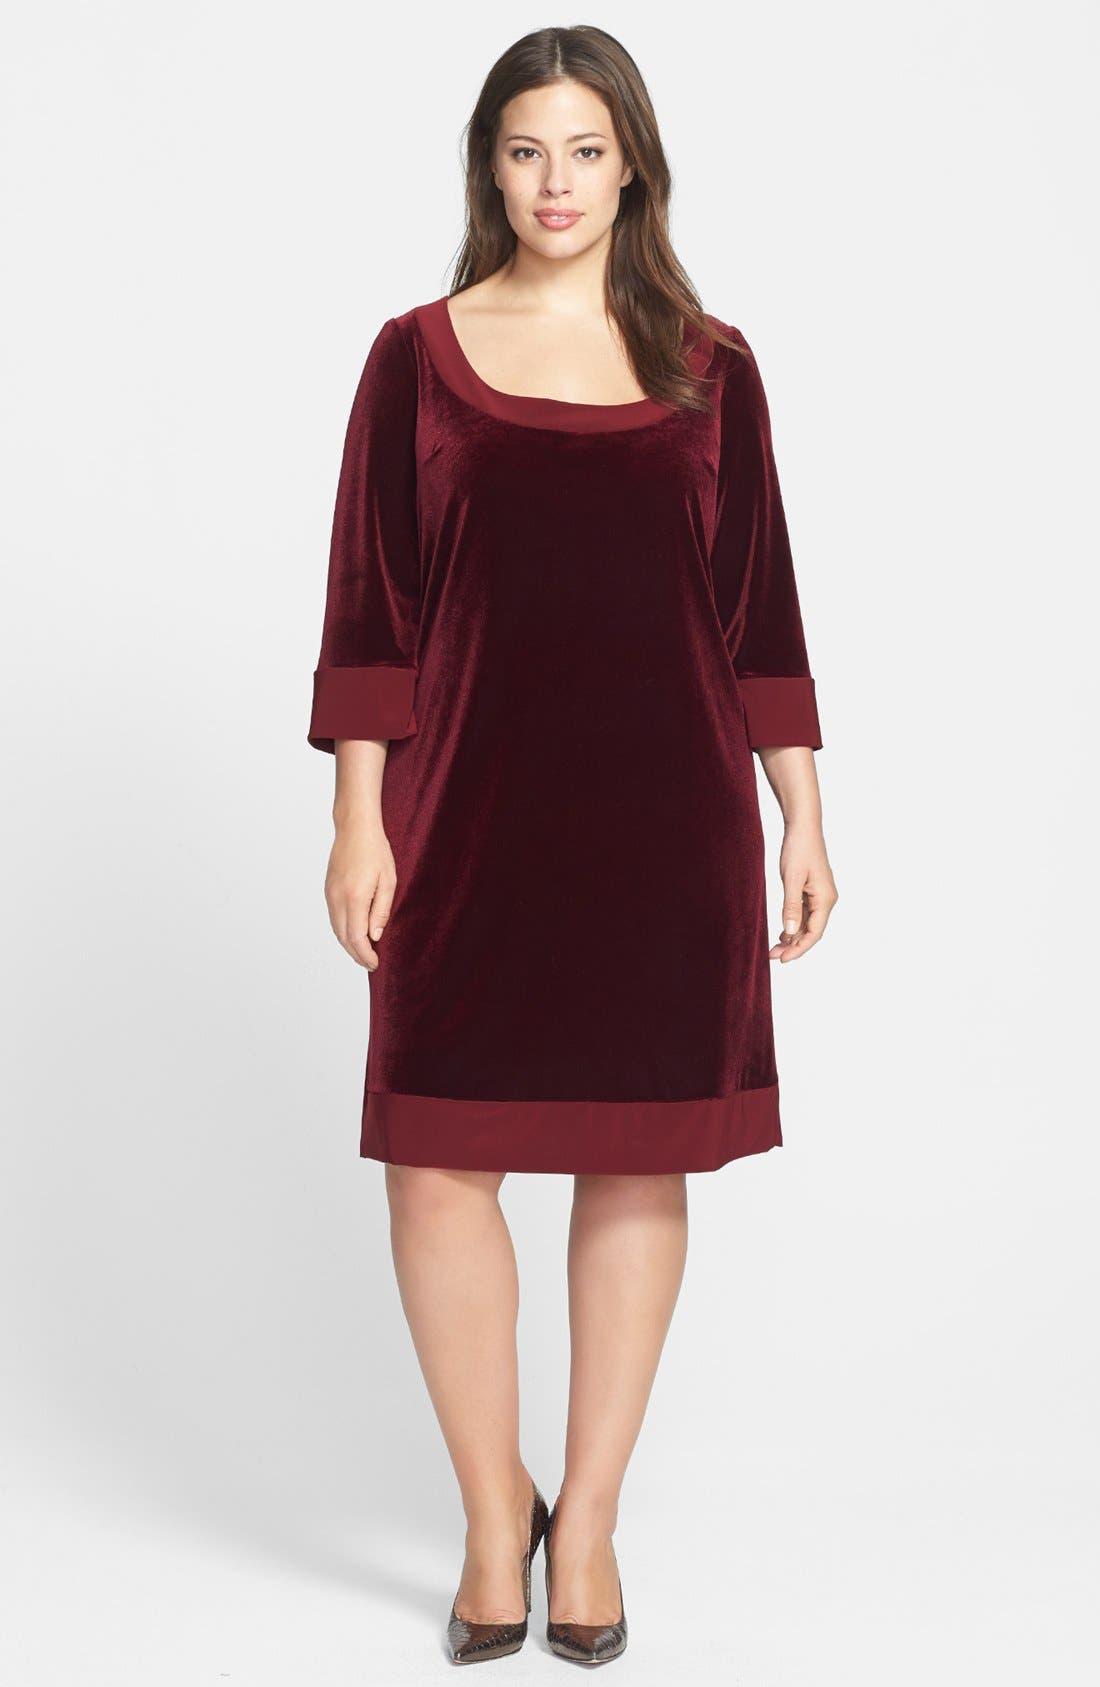 Main Image - ABS by Allen Schwartz Velvet Shift Dress (Plus Size)